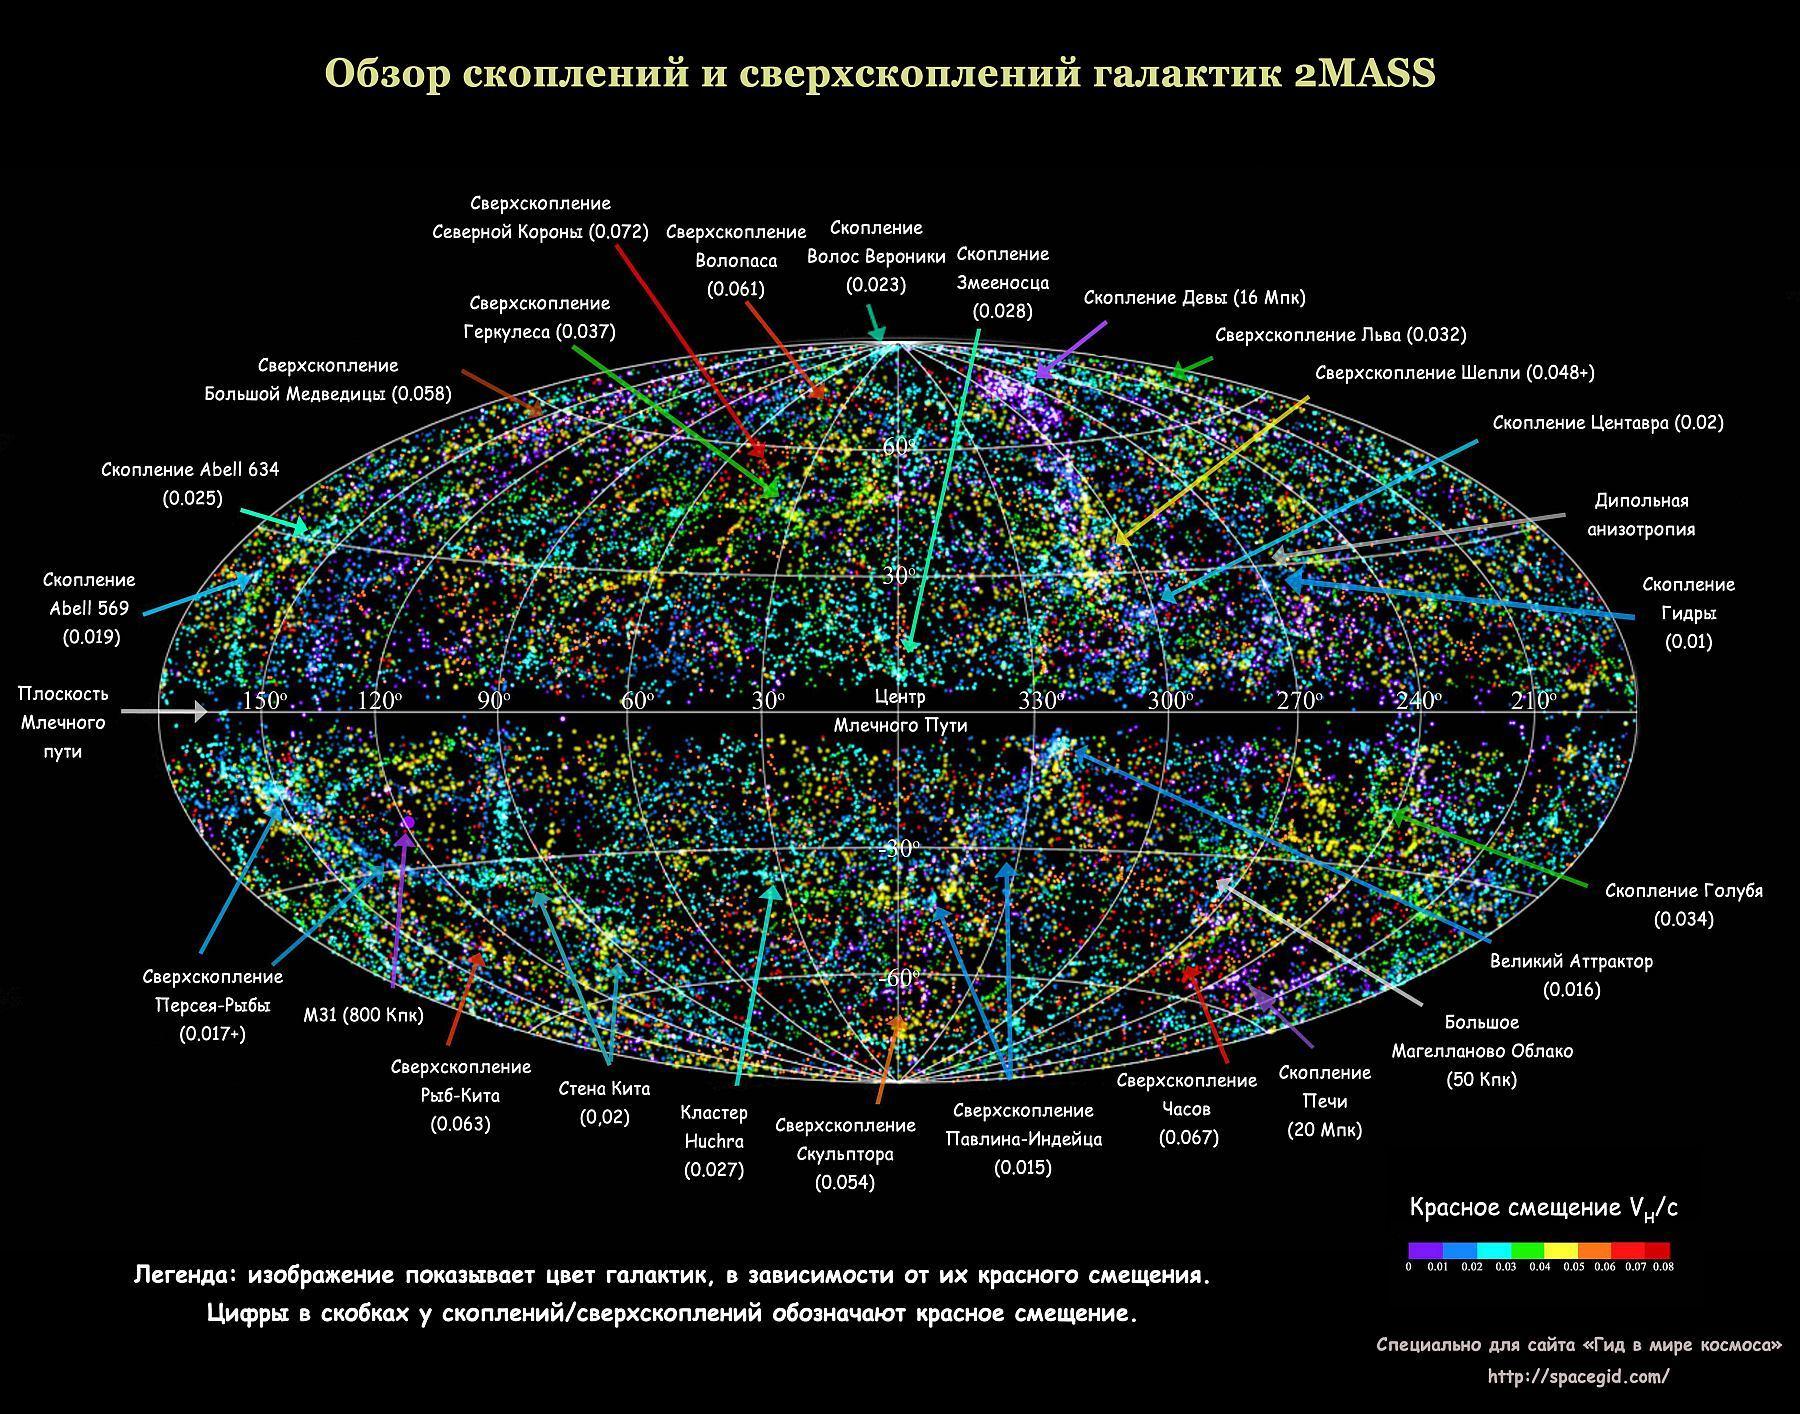 https://spacegid.com/wp-content/uploads/2015/03/Obzor-skopleniy-i-sverhskopleniy-galaktik-2MASS.jpg